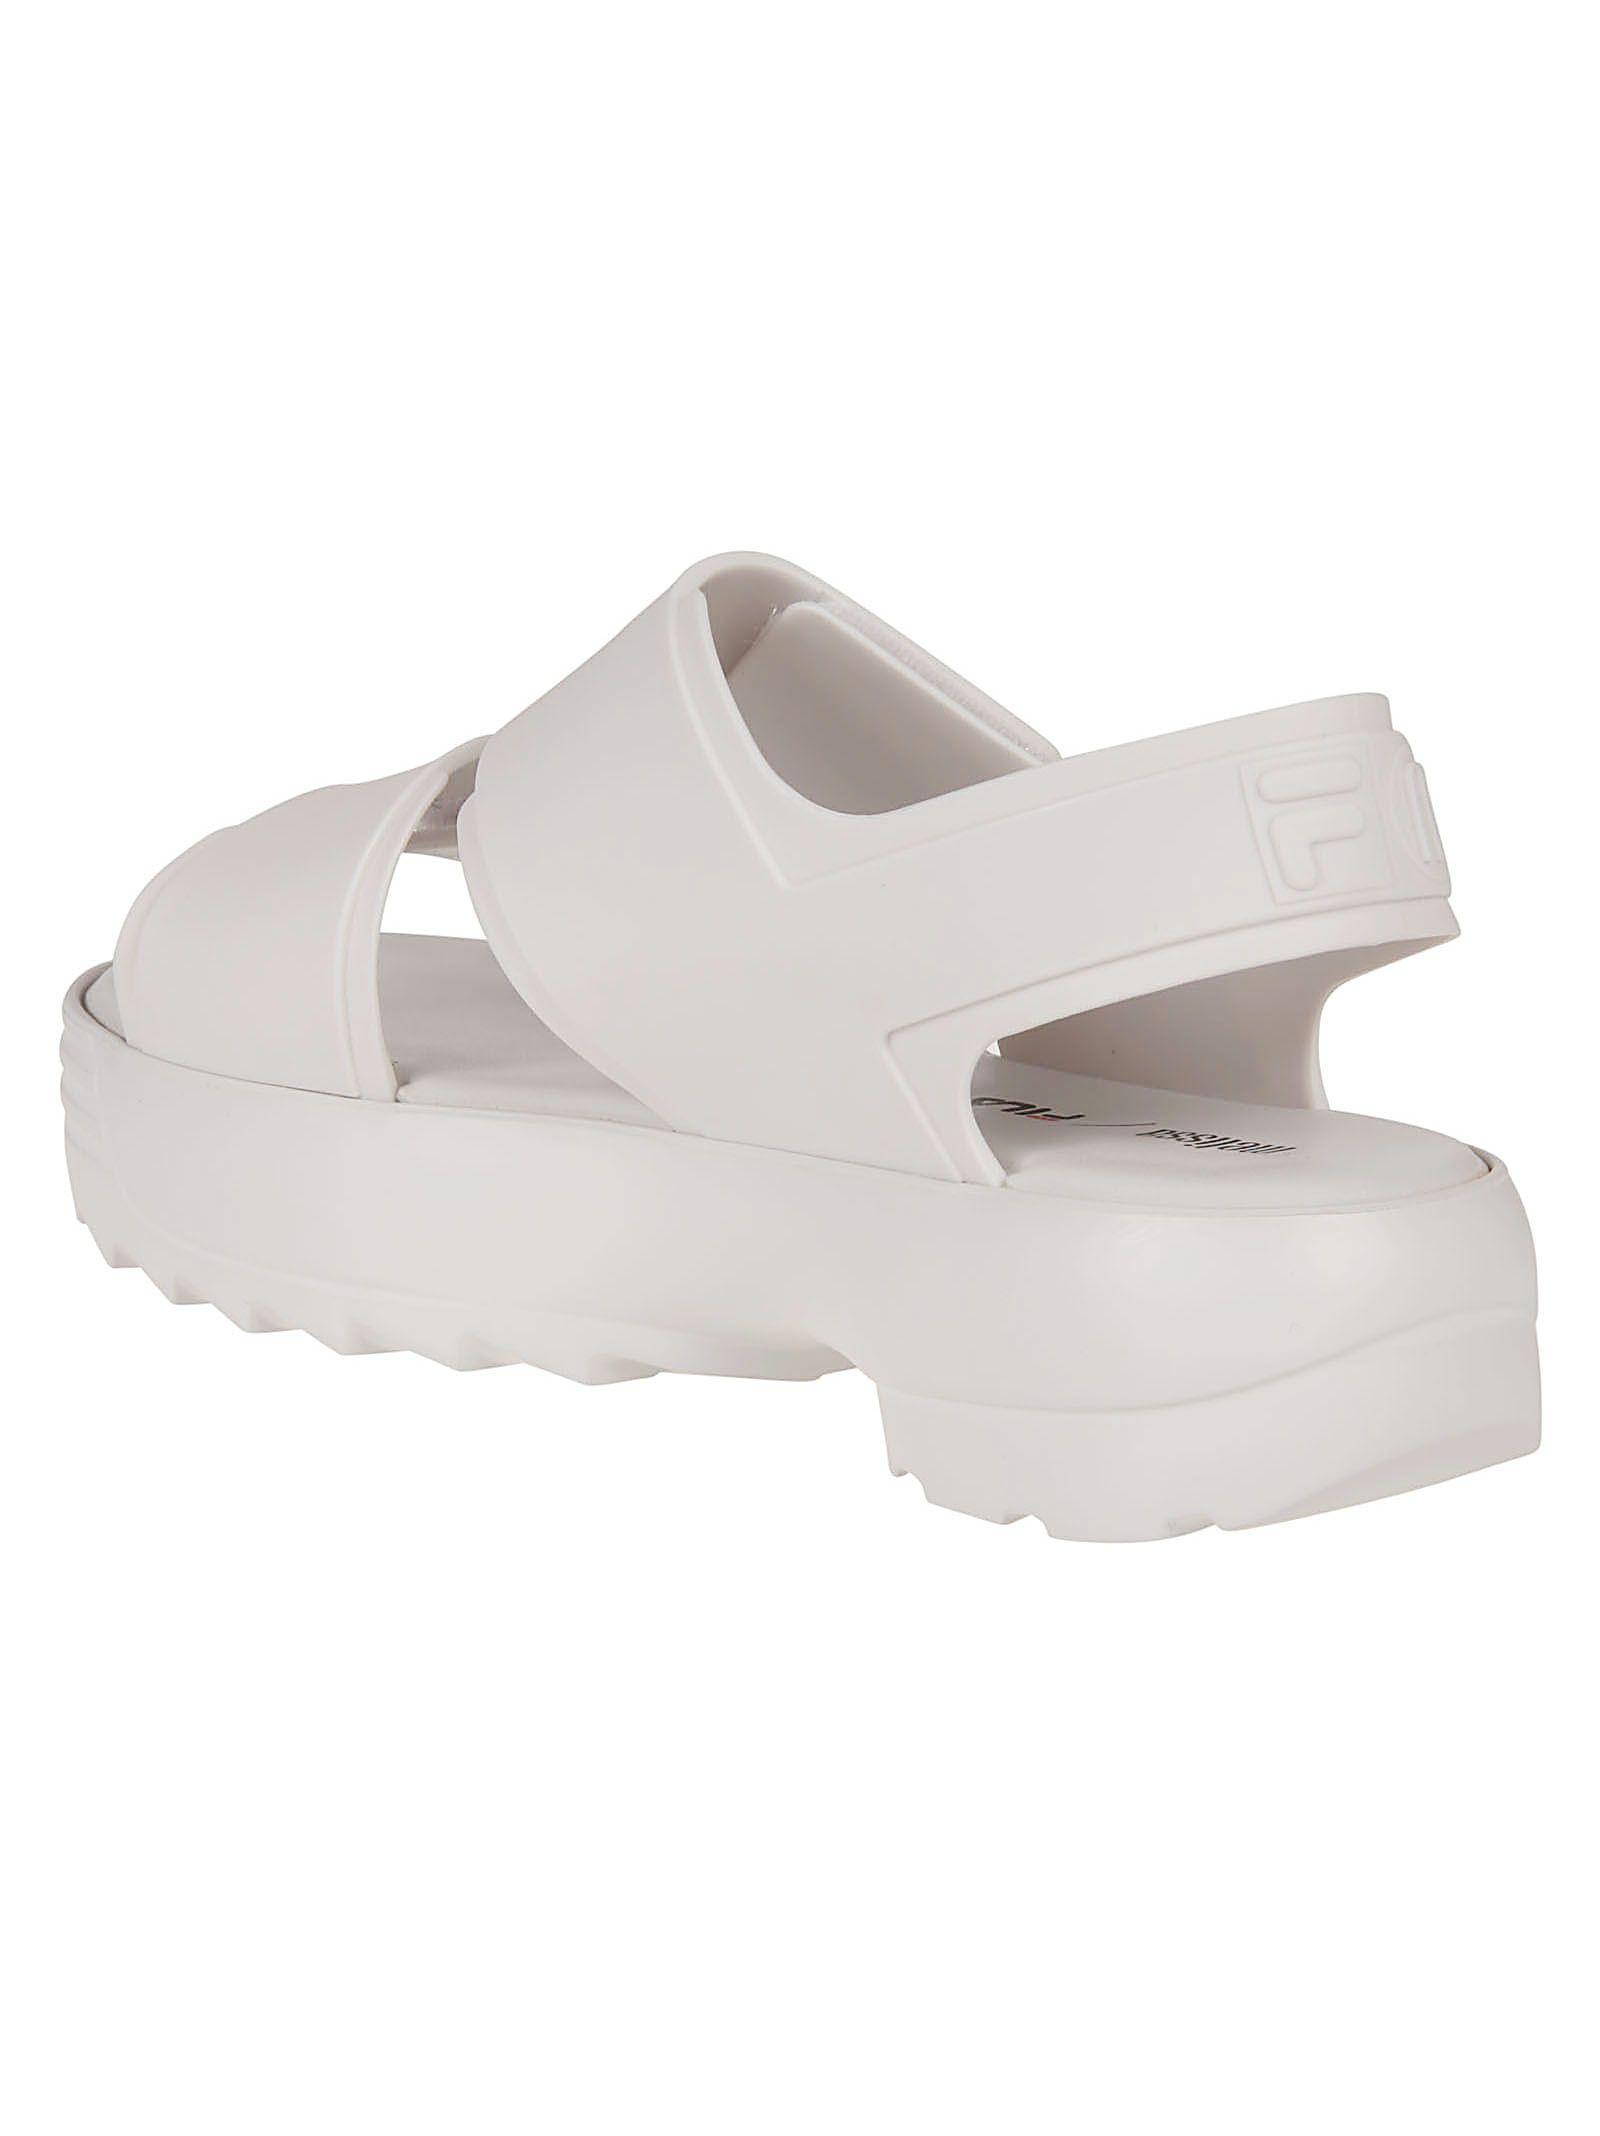 876fc93963b3 Melissa Melissa X Fila Classy Wedge Sandals - White - 10908832